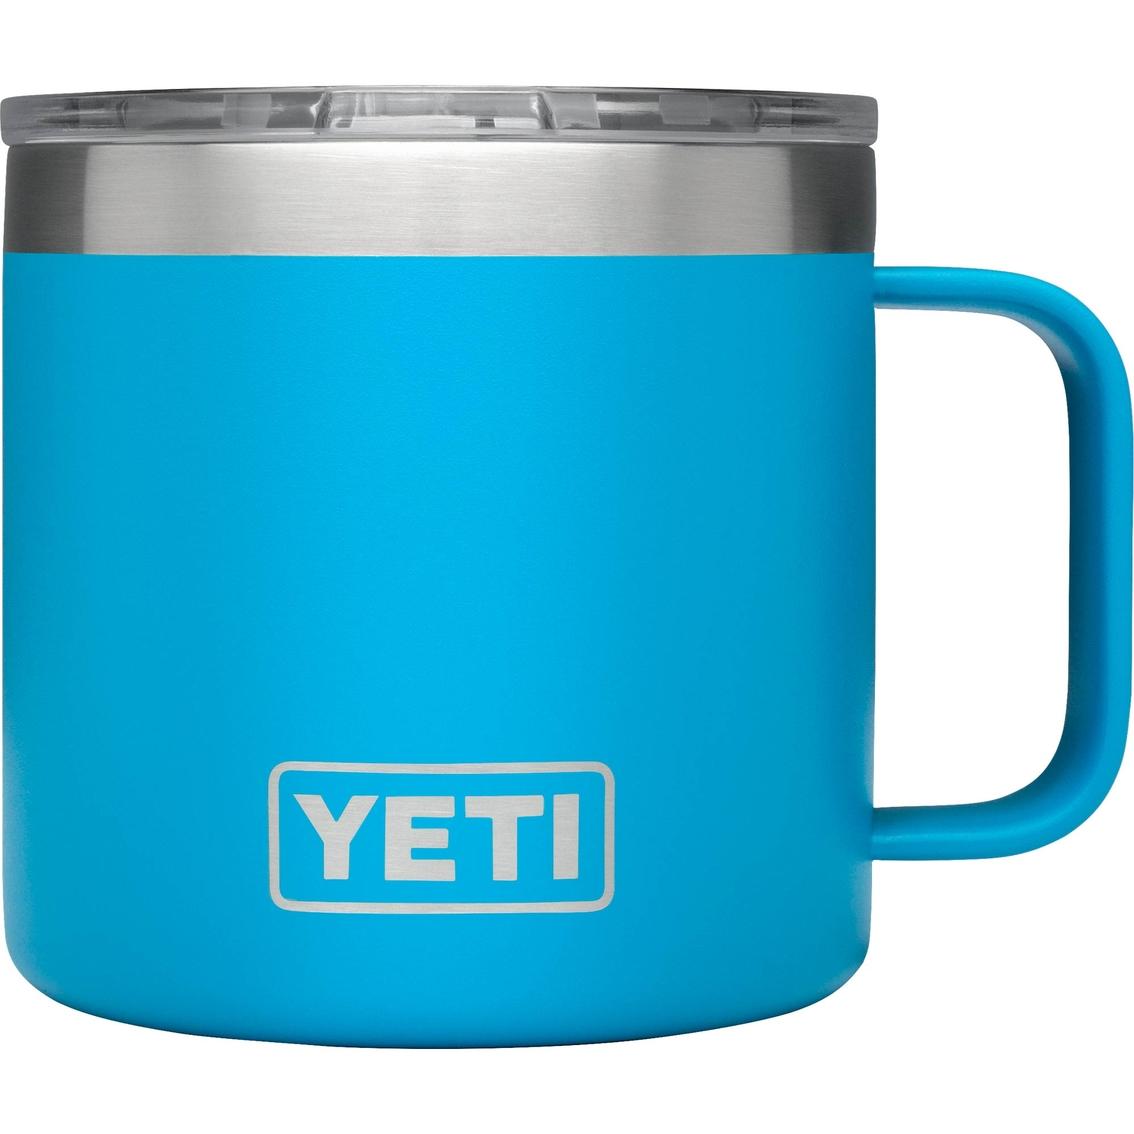 3f8e7b3f7d6 Yeti Rambler 14 Oz. Mug | Hydration | Sports & Outdoors | Shop The ...